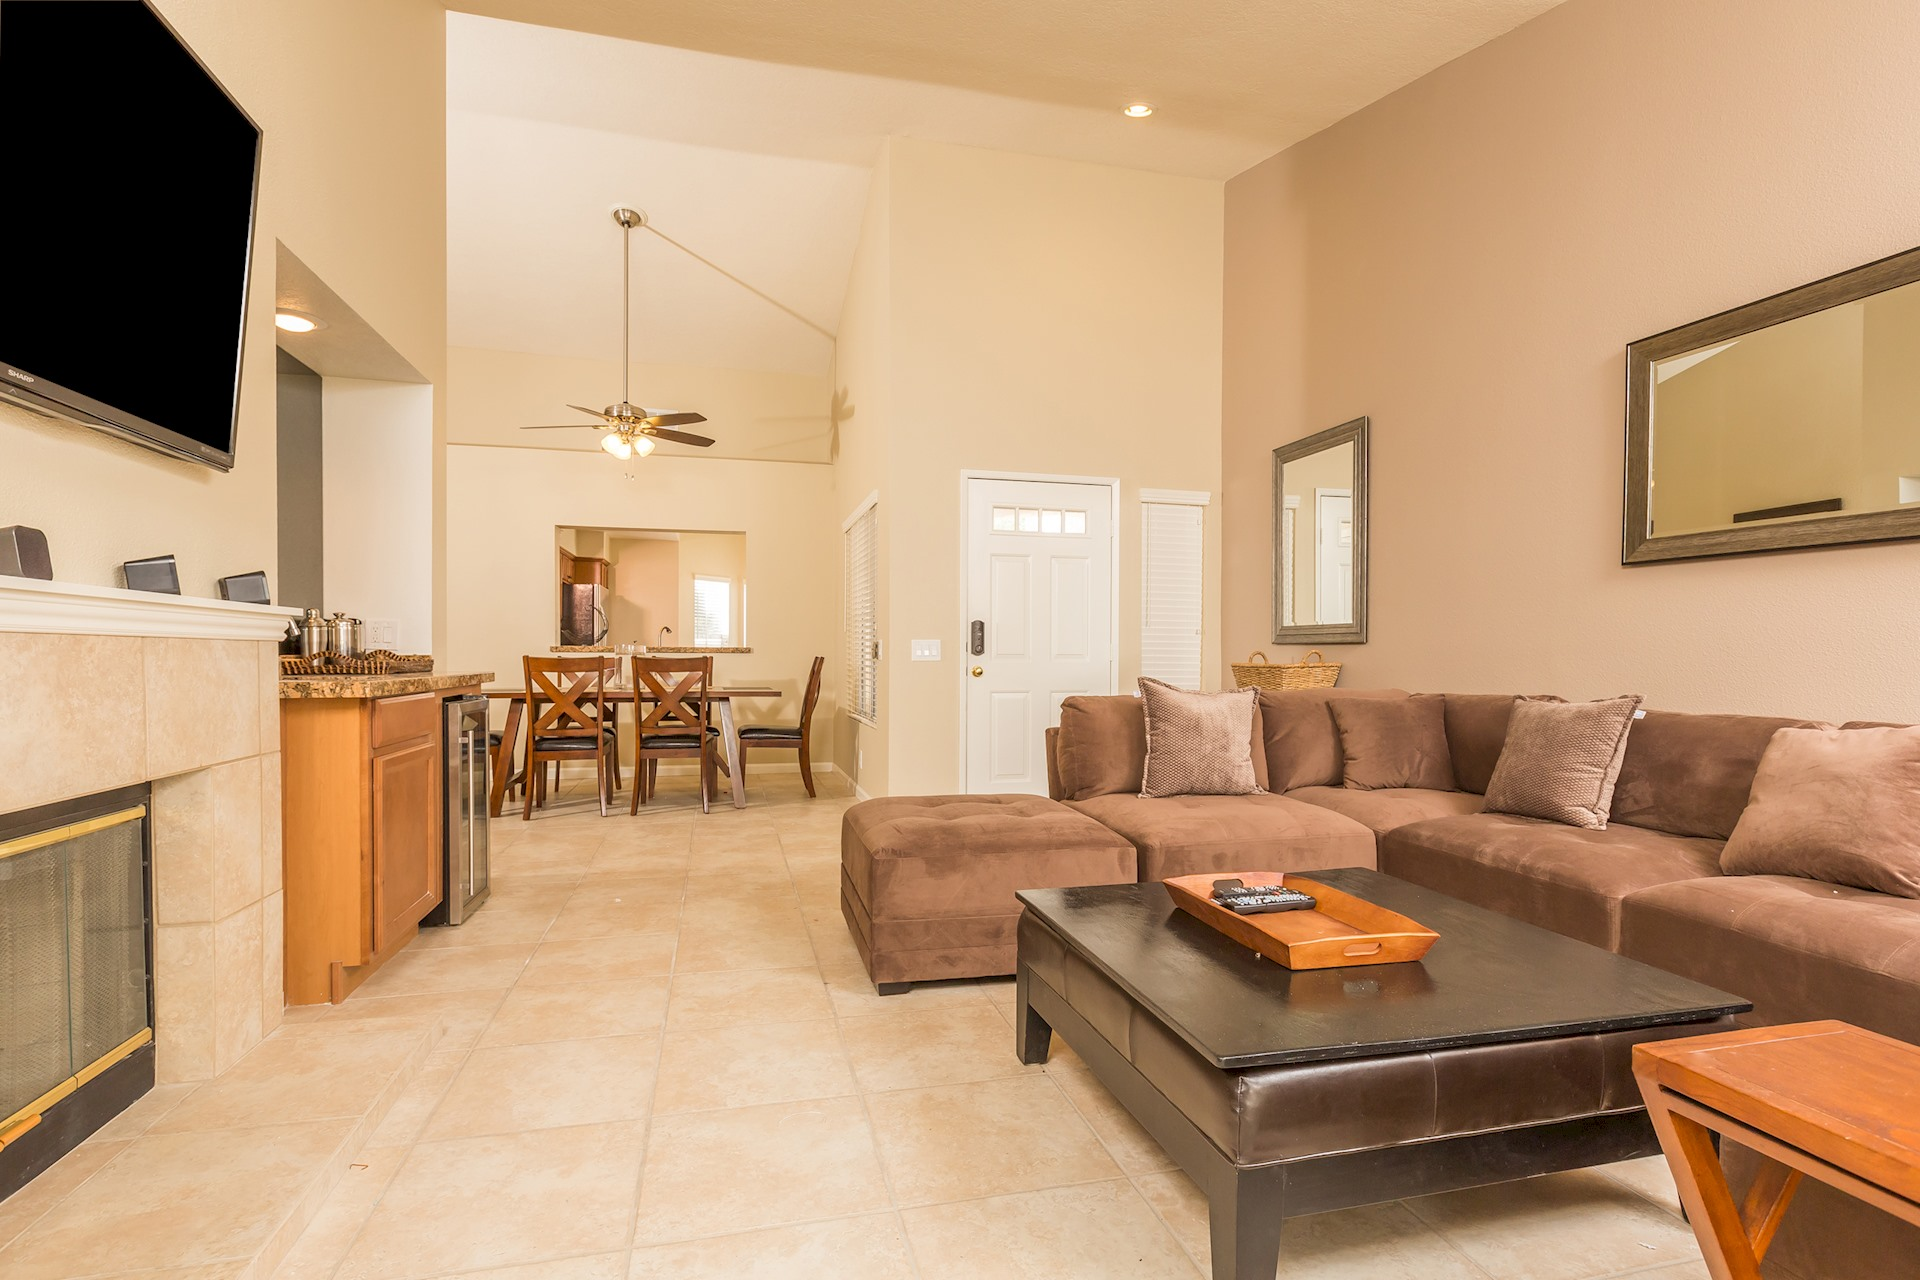 Apartment PALM DESERT LUXURY VIP HOME w POOL DESERT PARADISE photo 20215262